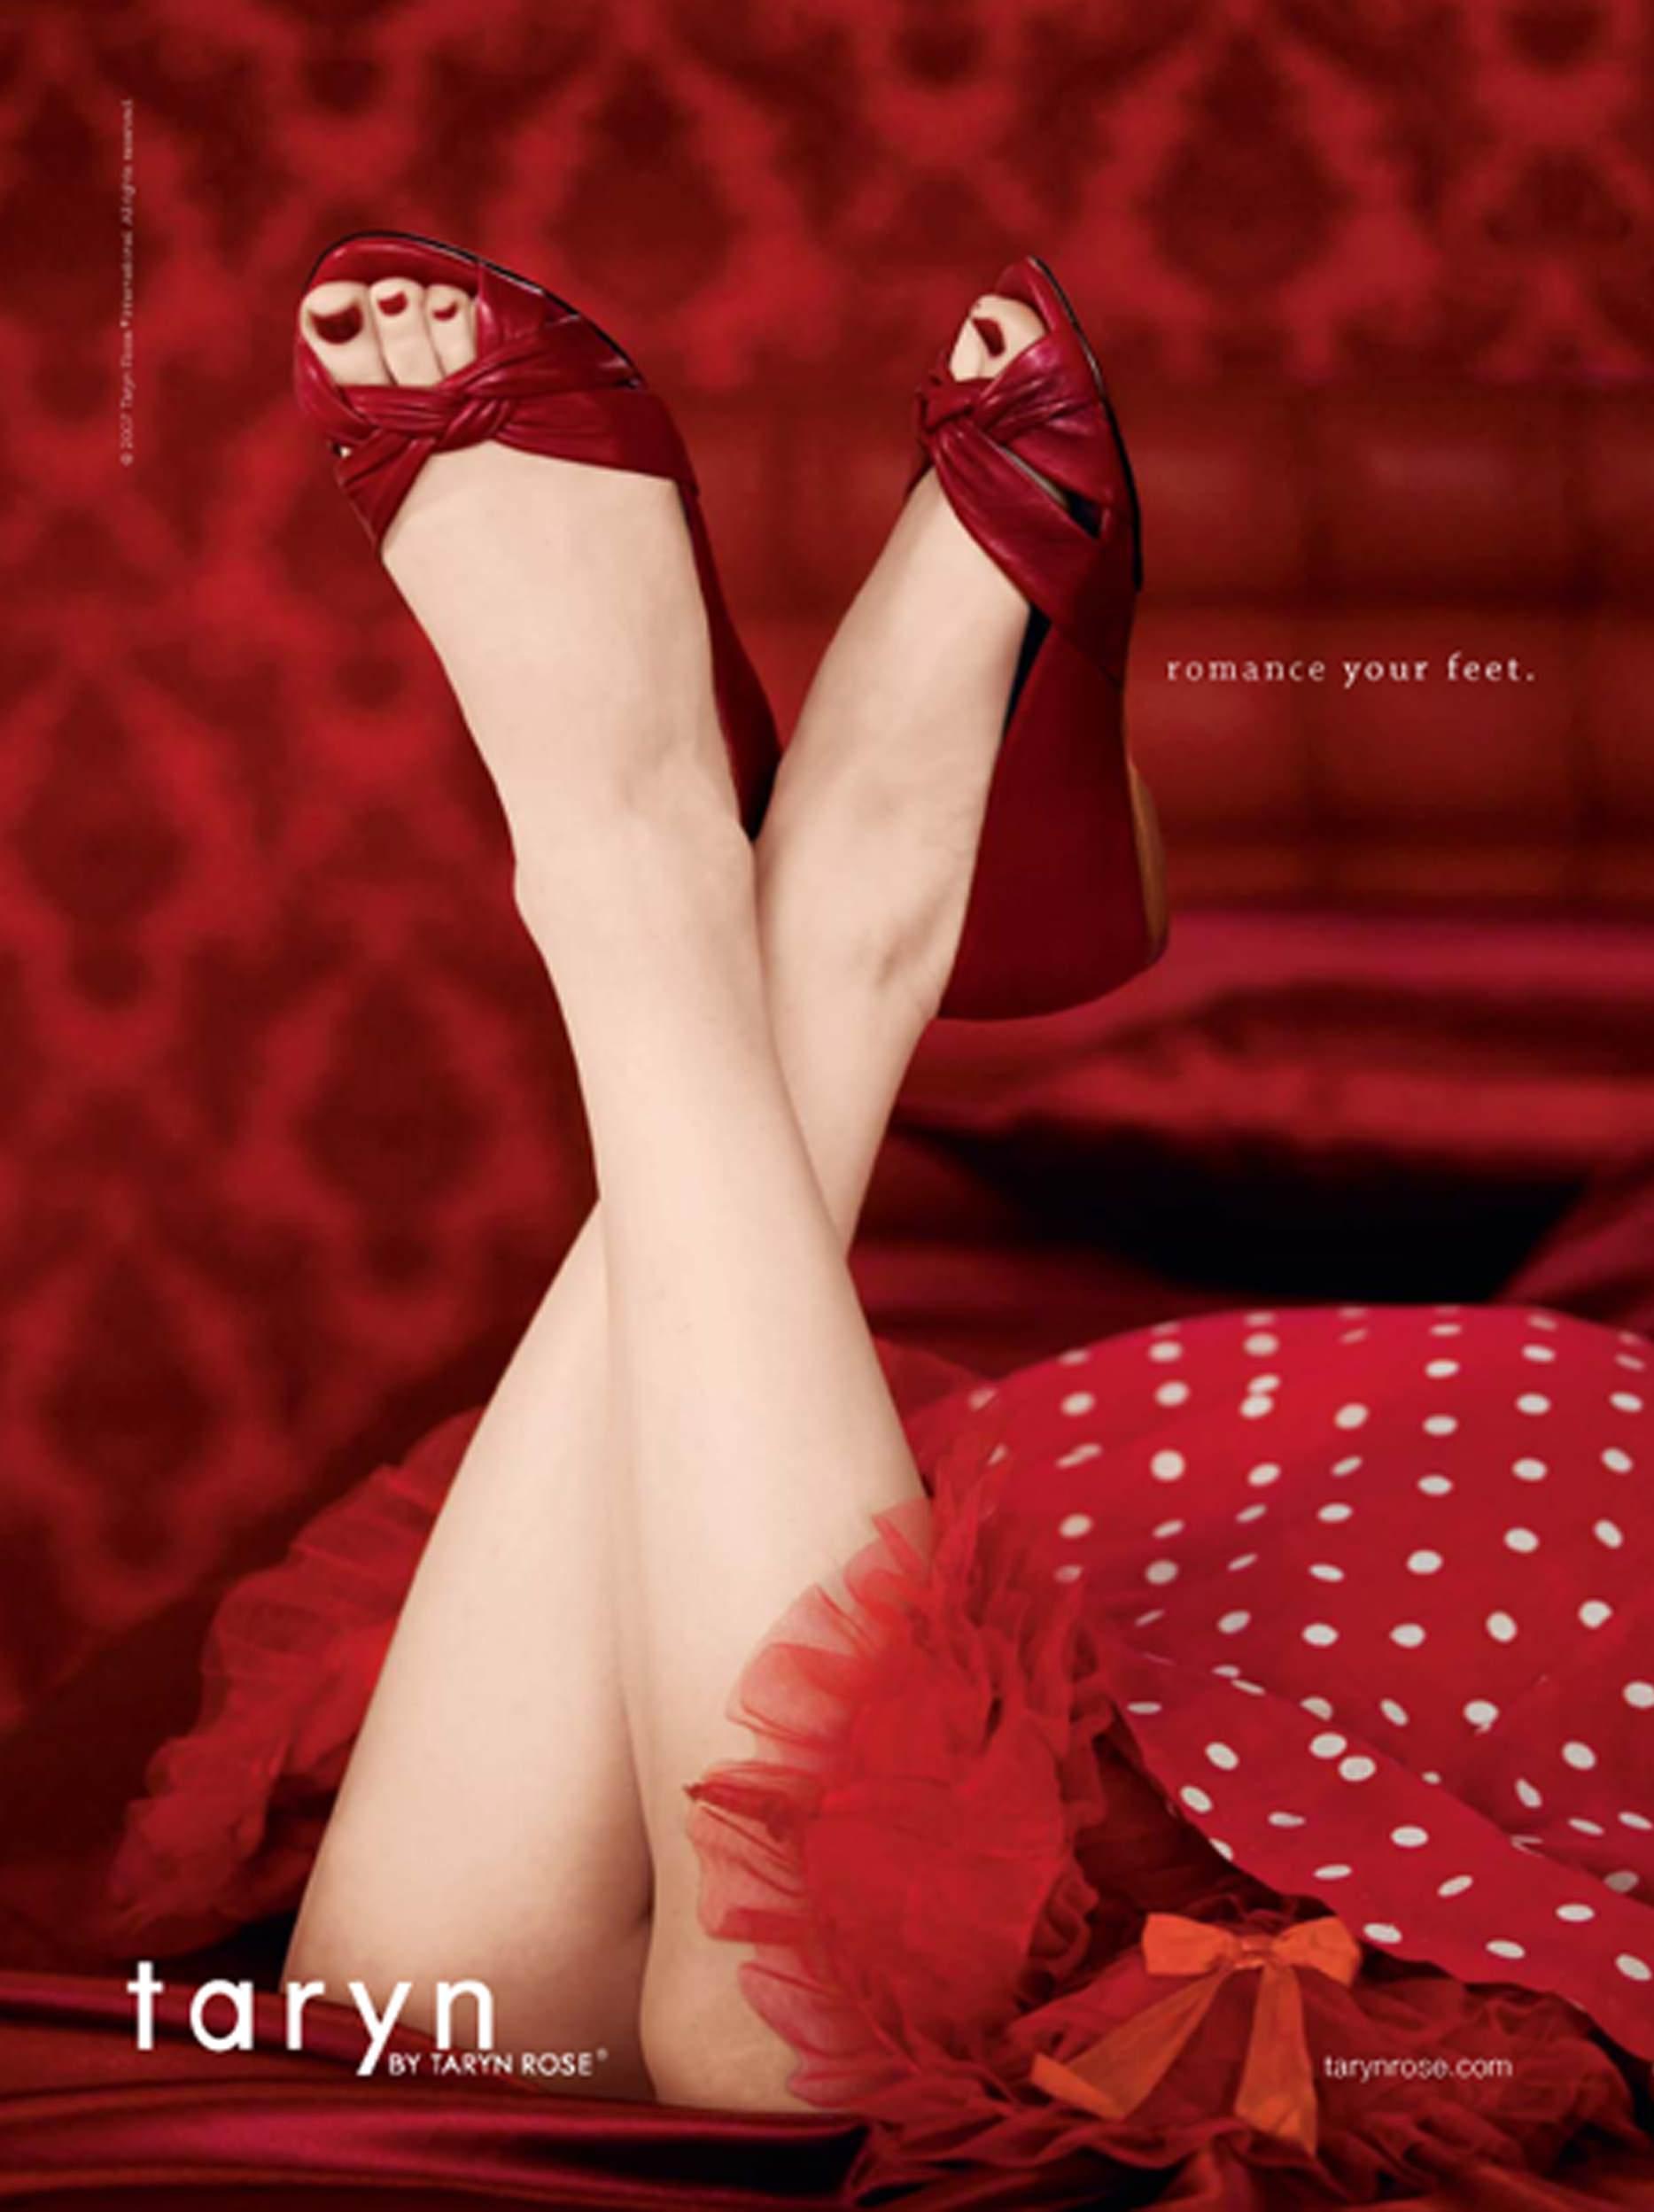 ative_Director_Taryn_Rose_Shoes_PRINT_T_BY_T_ROMANCE.jpg